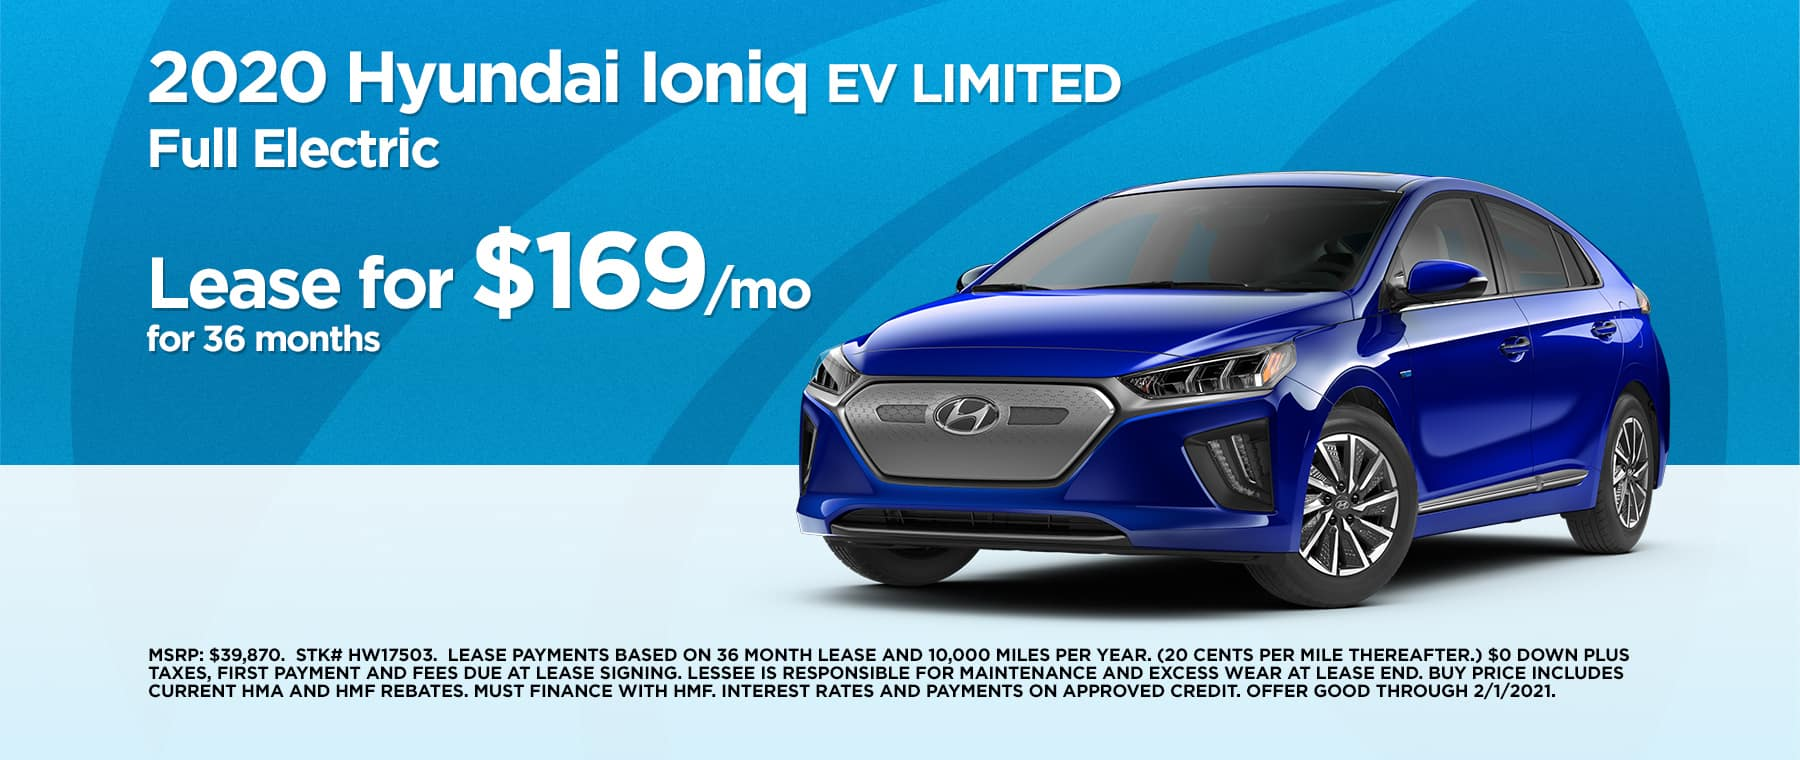 2101 Hyundai Ioniq EV